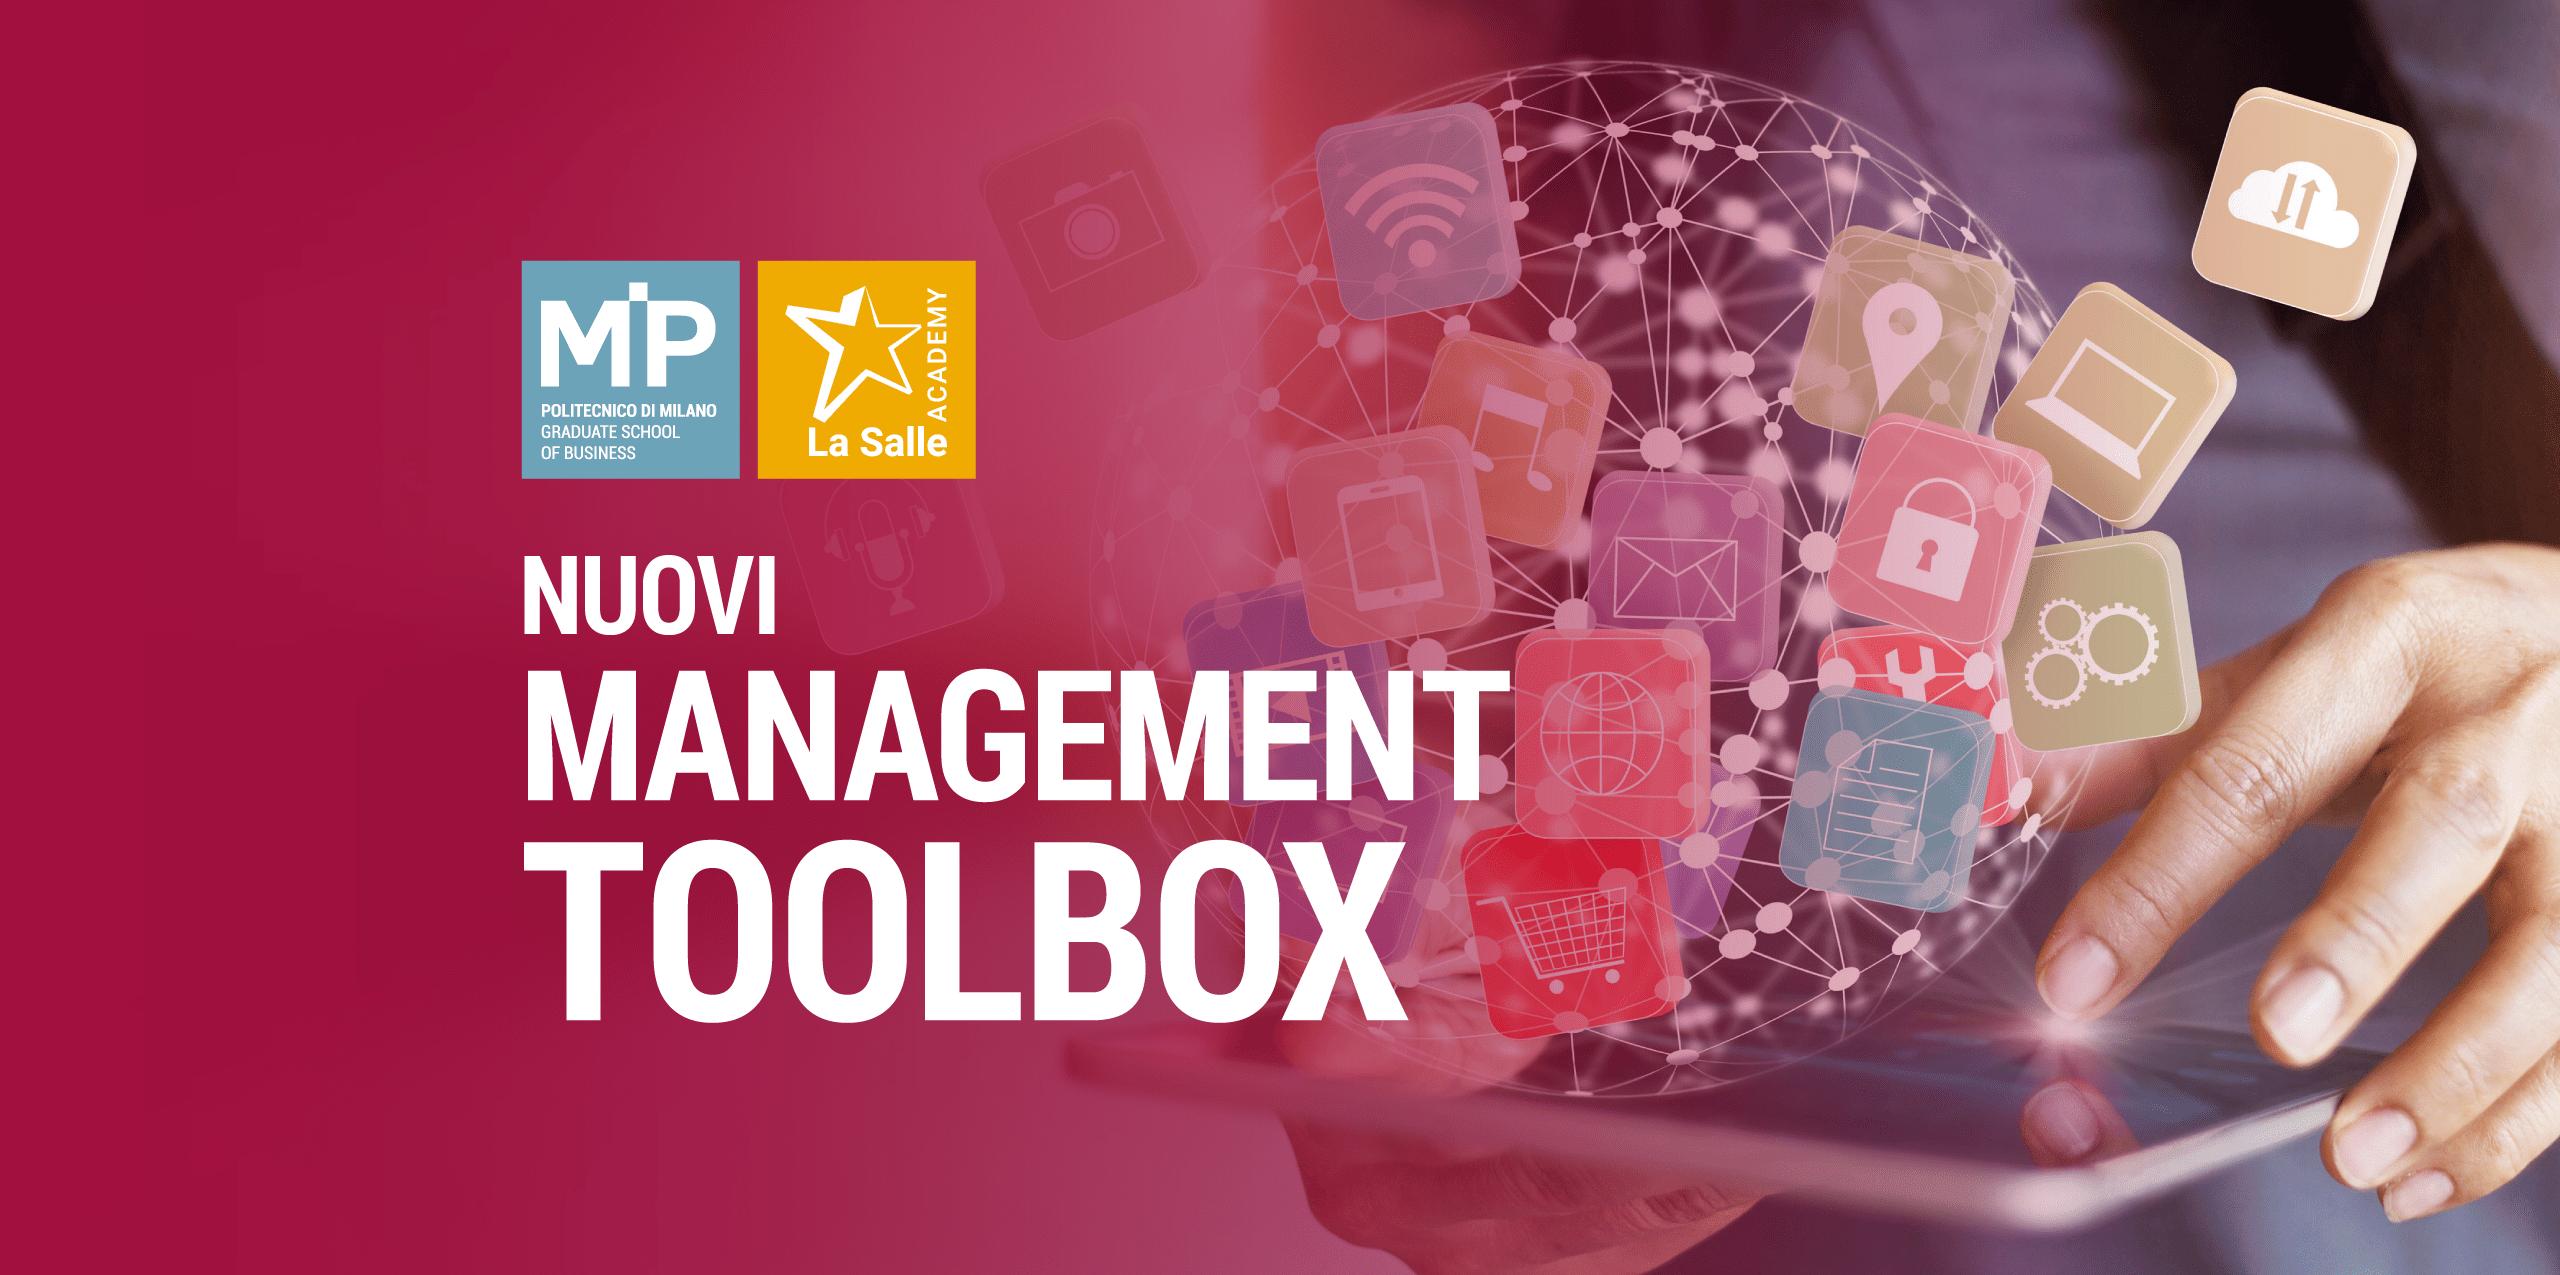 Management Toolbox